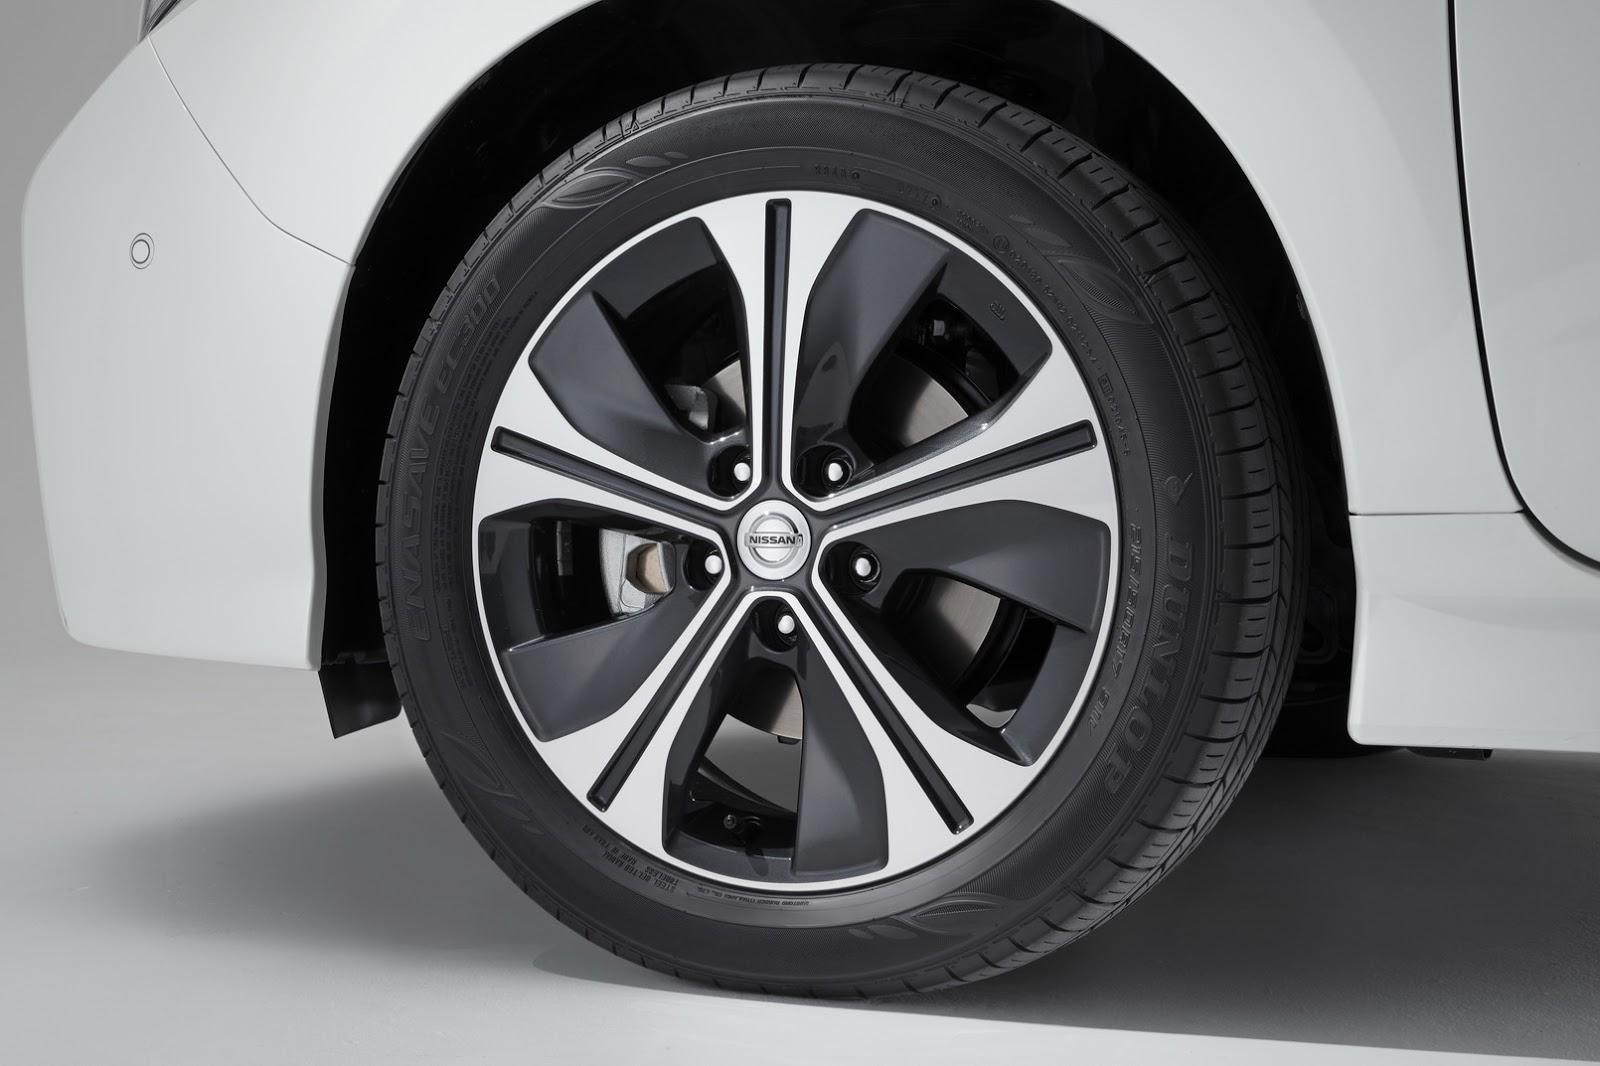 Nissan Leaf 2018 EU (19)